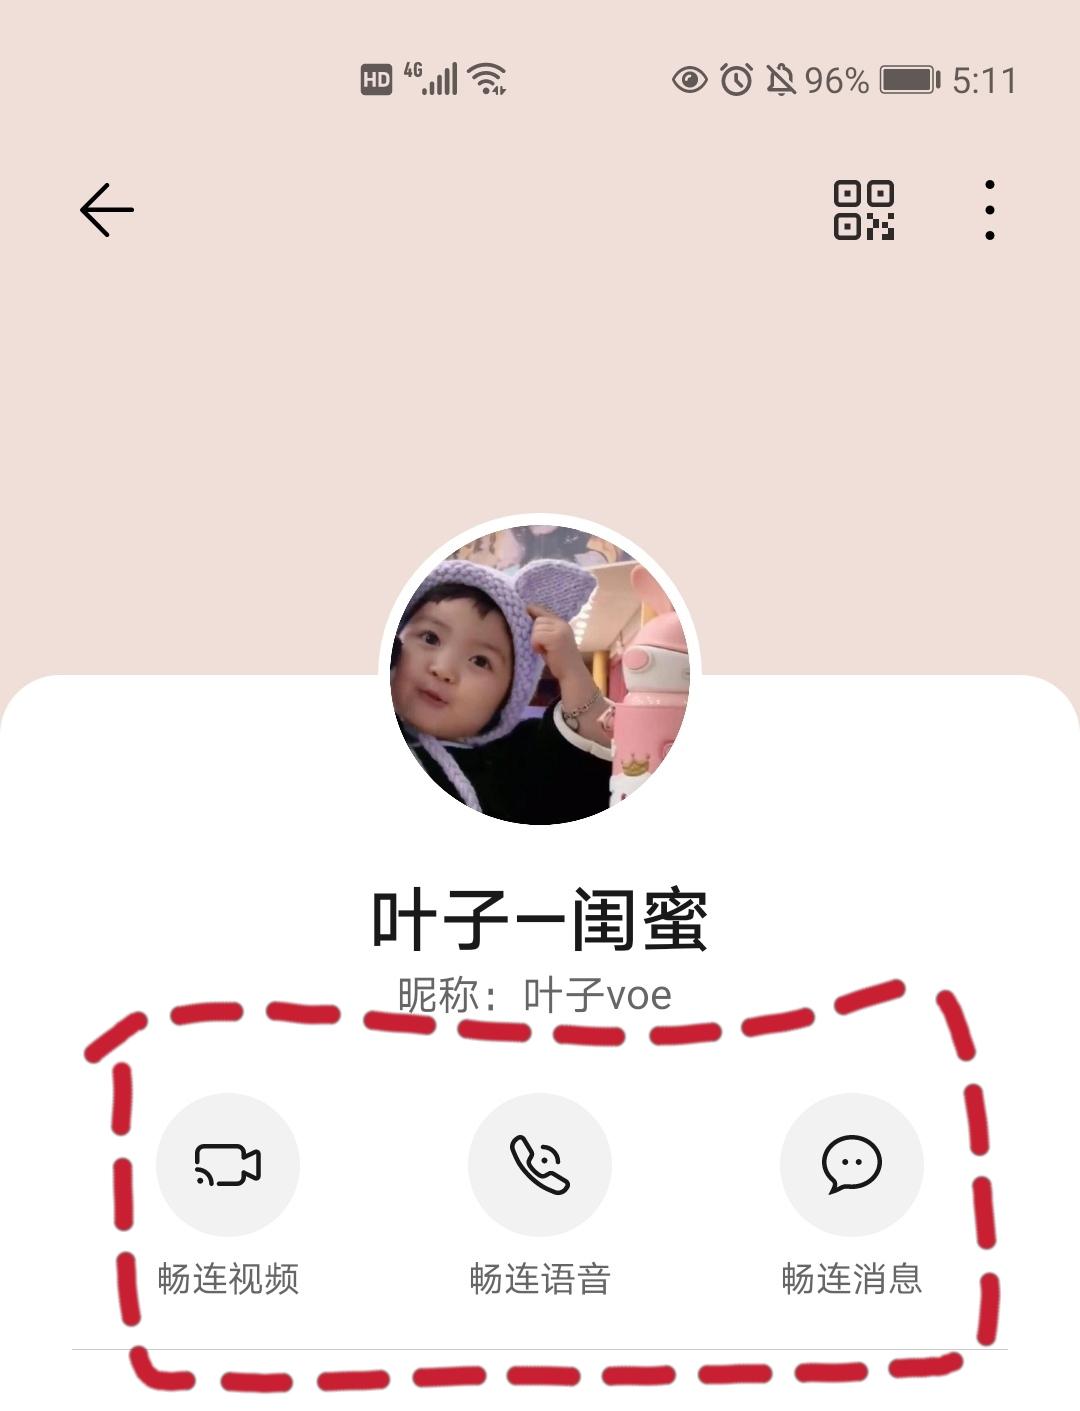 Screenshot_20210412_171148_com.huawei.meetime_edit_559677600244807_mh1618219064825.jpg